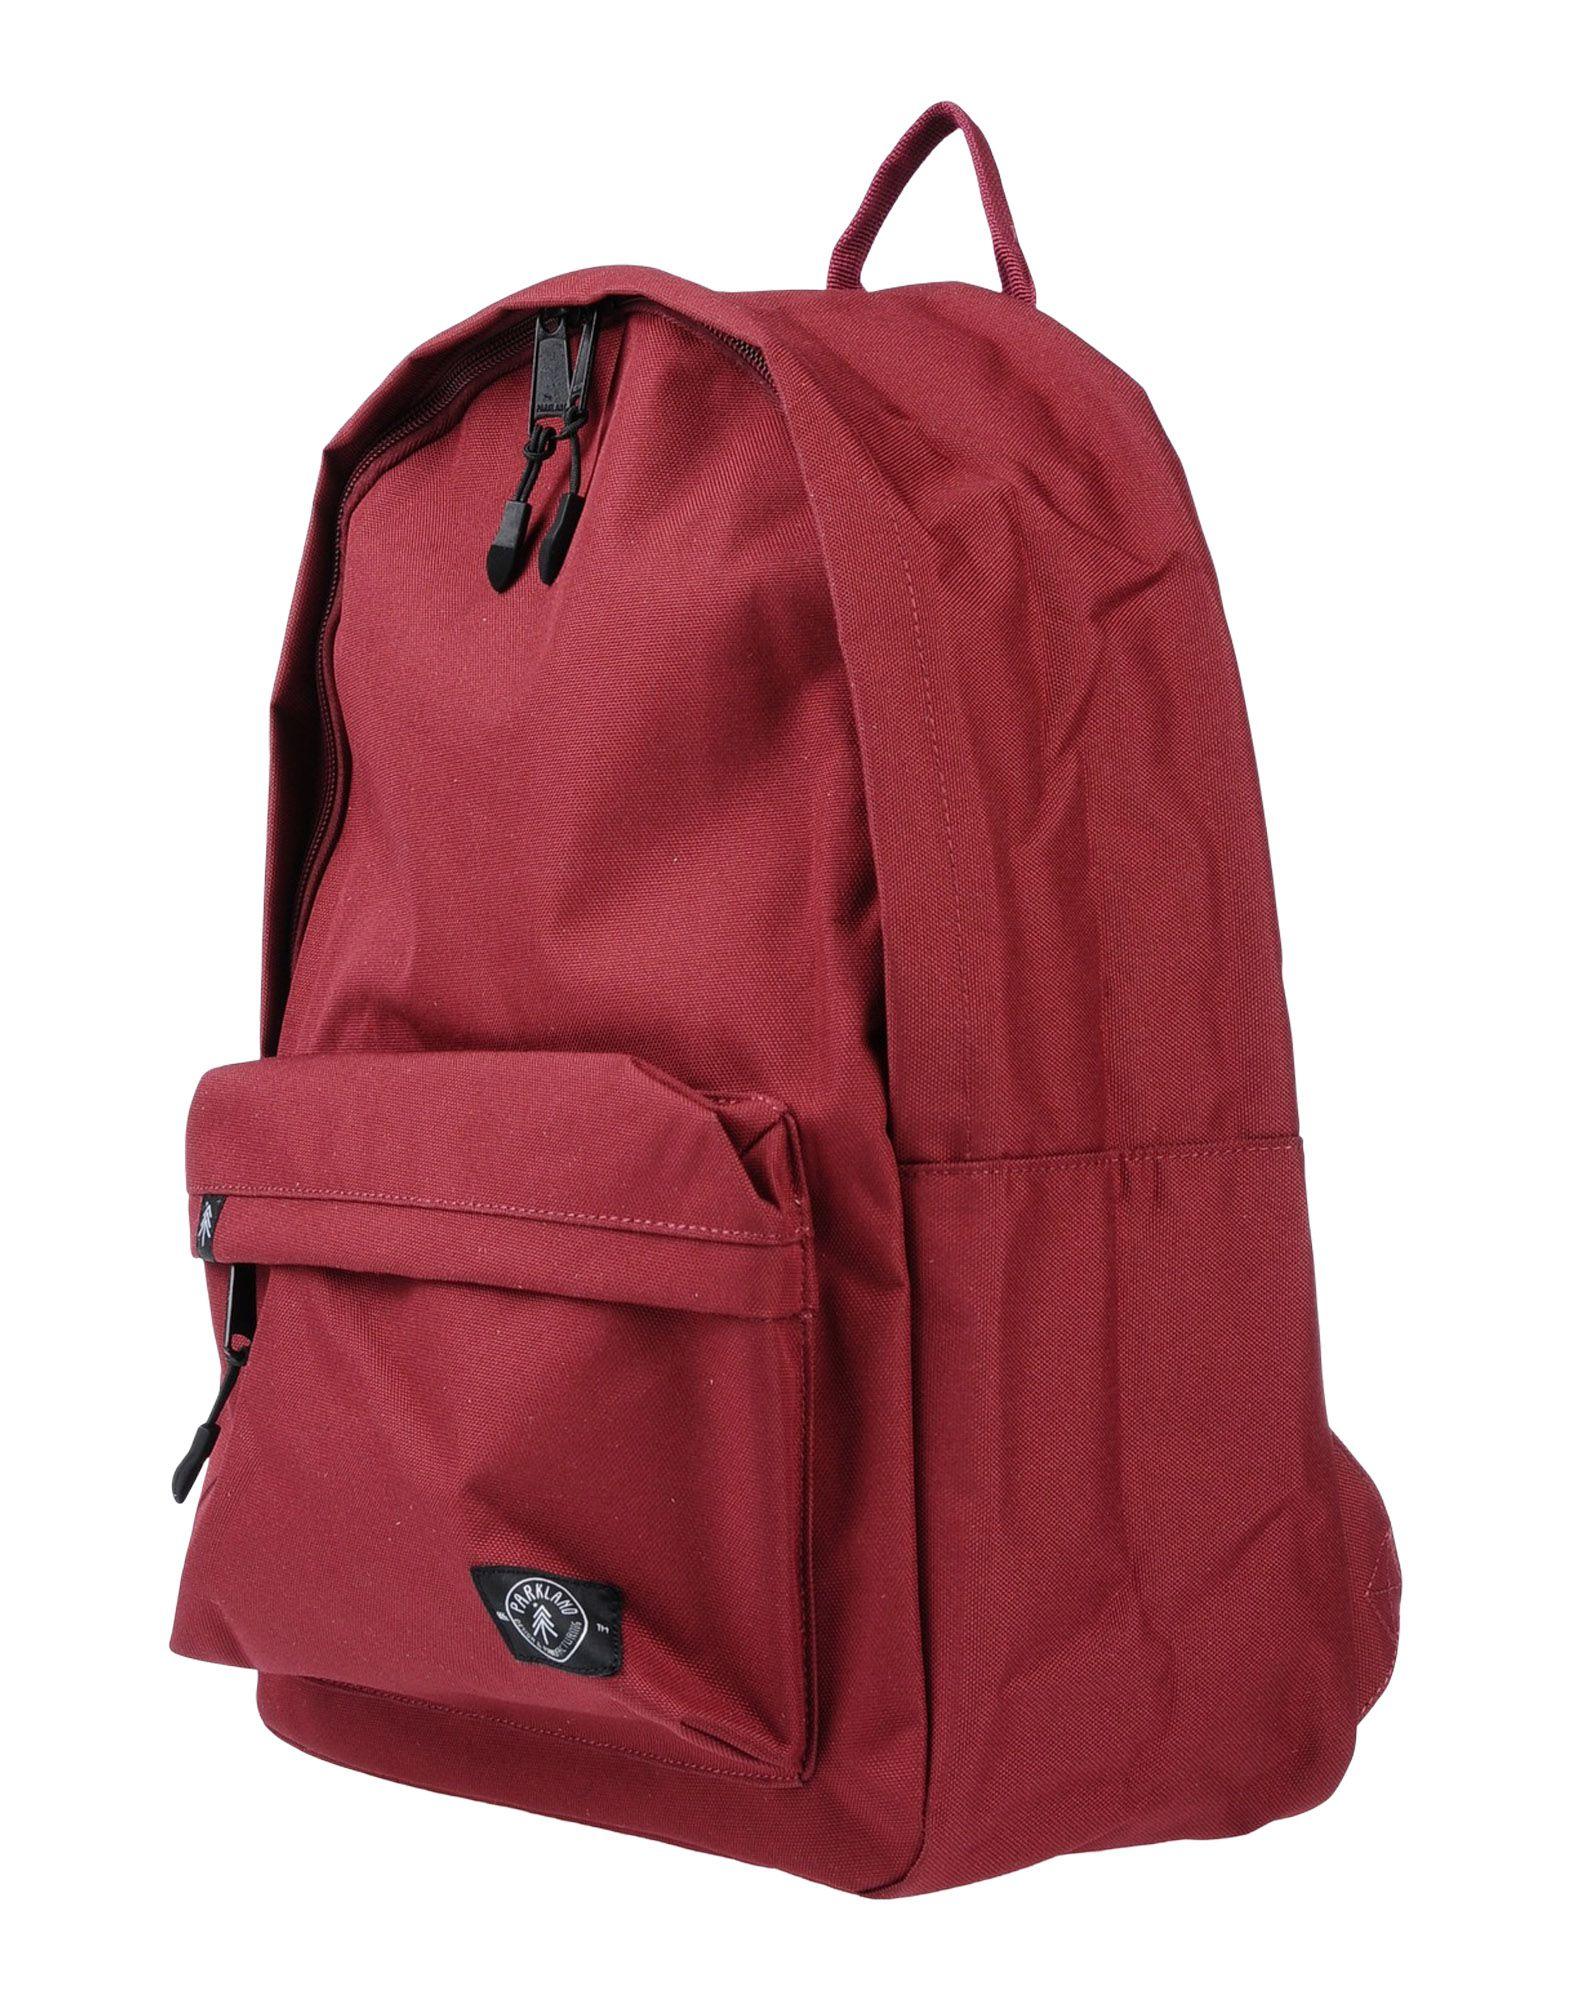 PARKLAND Рюкзаки и сумки на пояс воблер rapala глубоко погружающийся длина 12 см вес 15 г dhj12 s